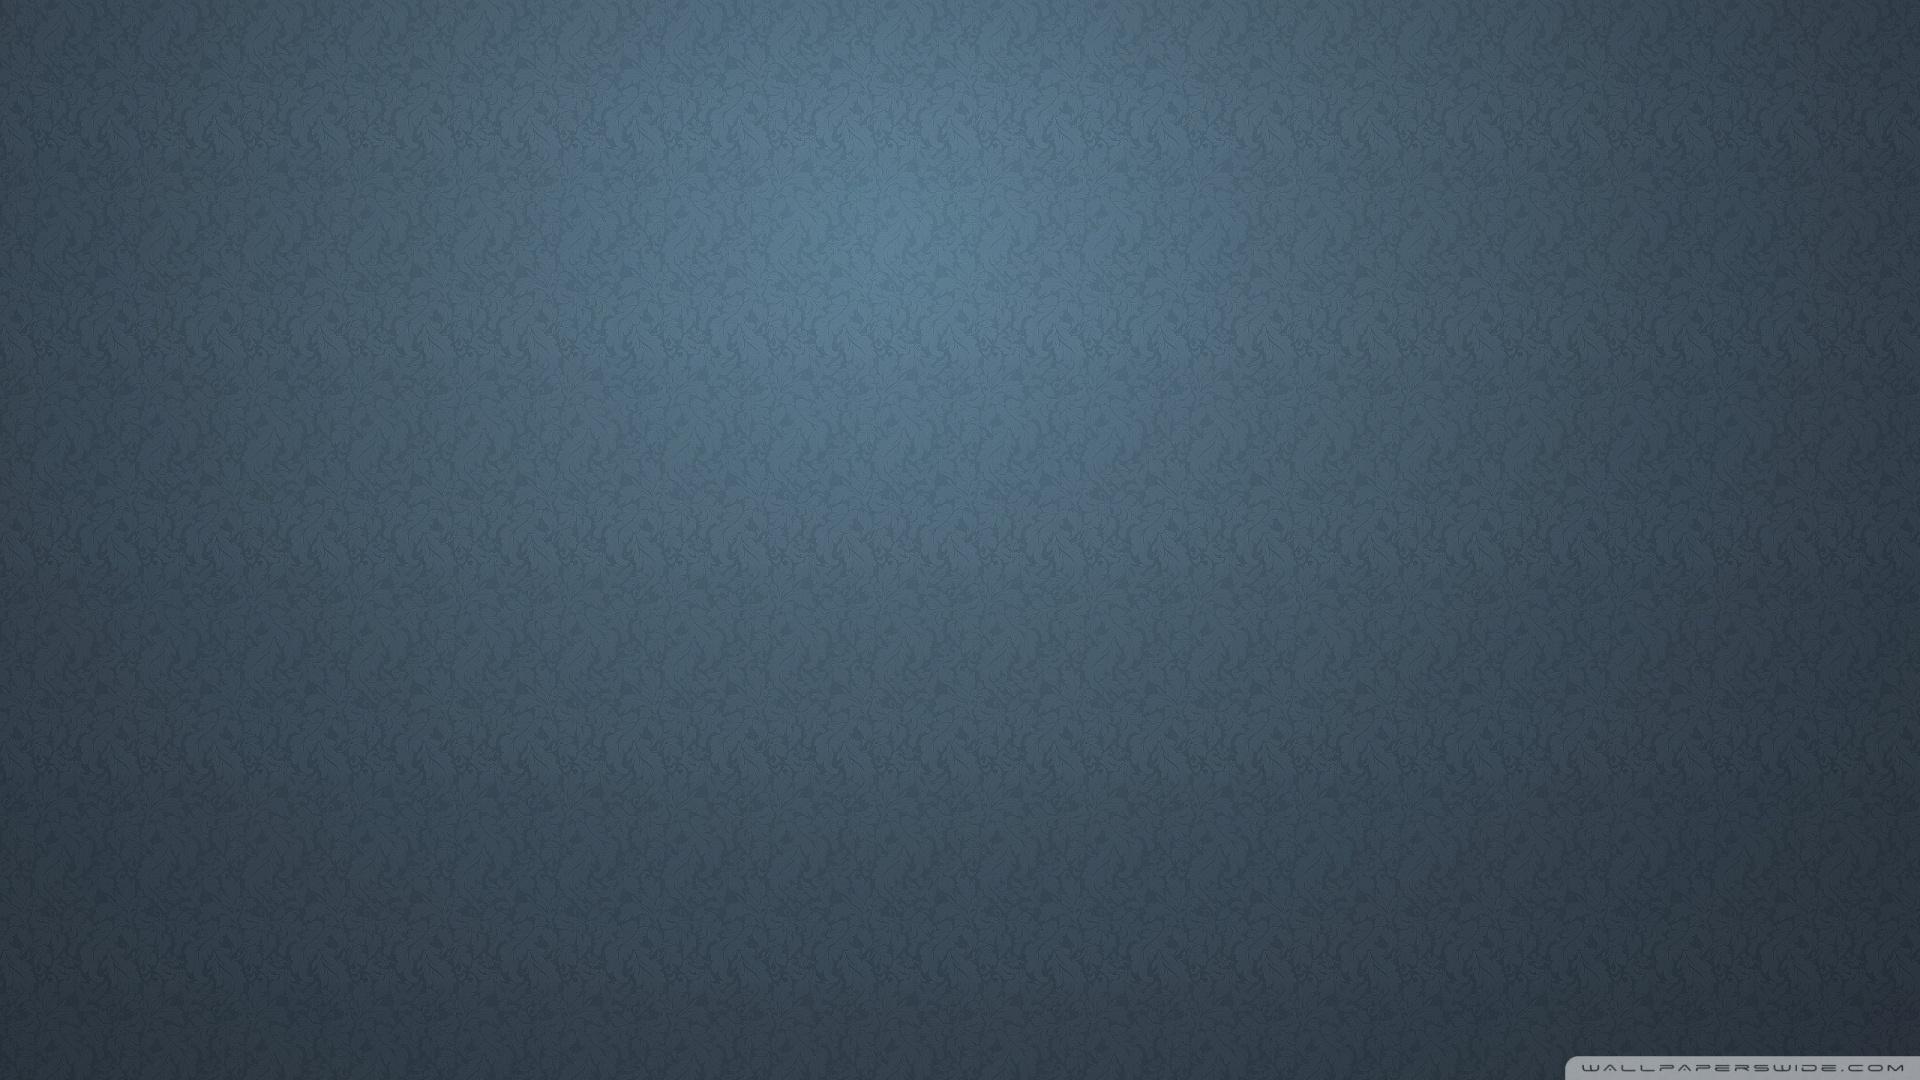 Blue Gray Pattern Wallpaper 1920x1080 Blue Gray Pattern 1920x1080